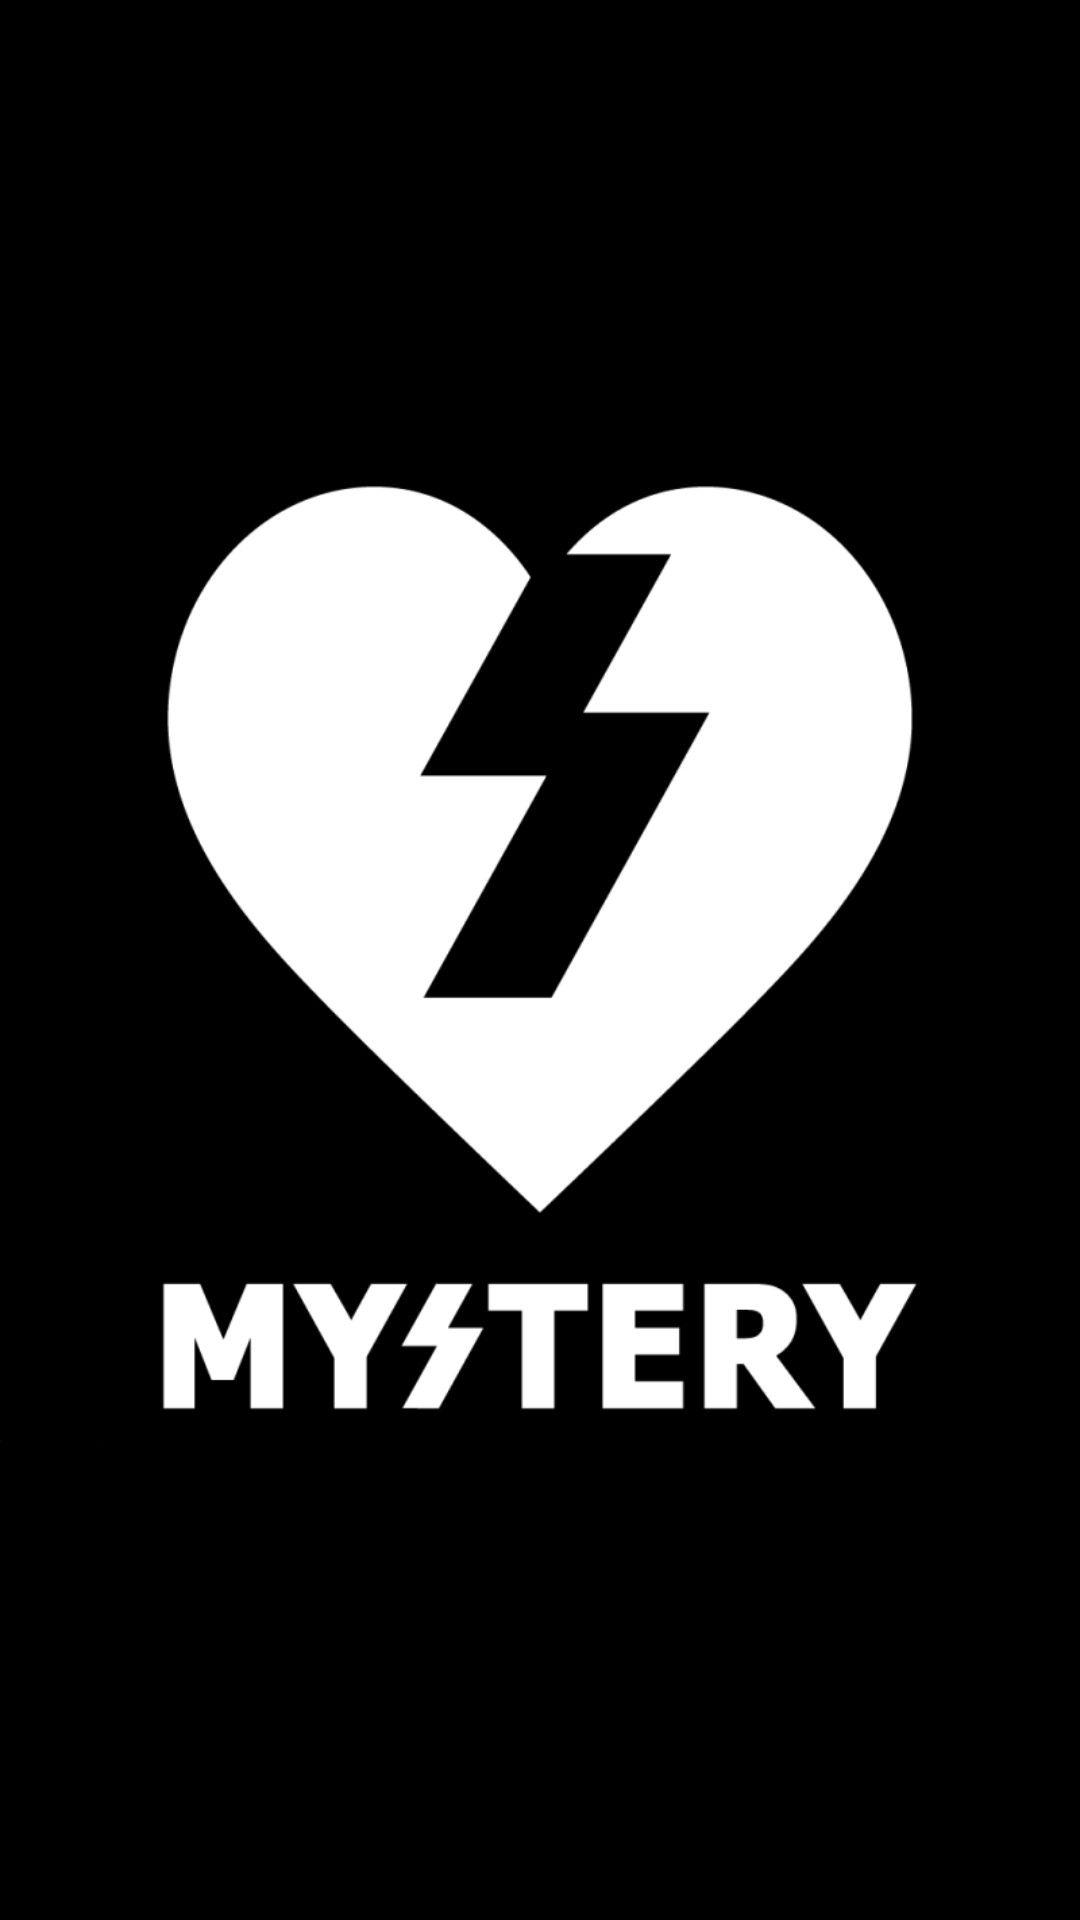 Mystery Skateboard Wallpaper Kaos Gaya Hidup Sehat Stiker